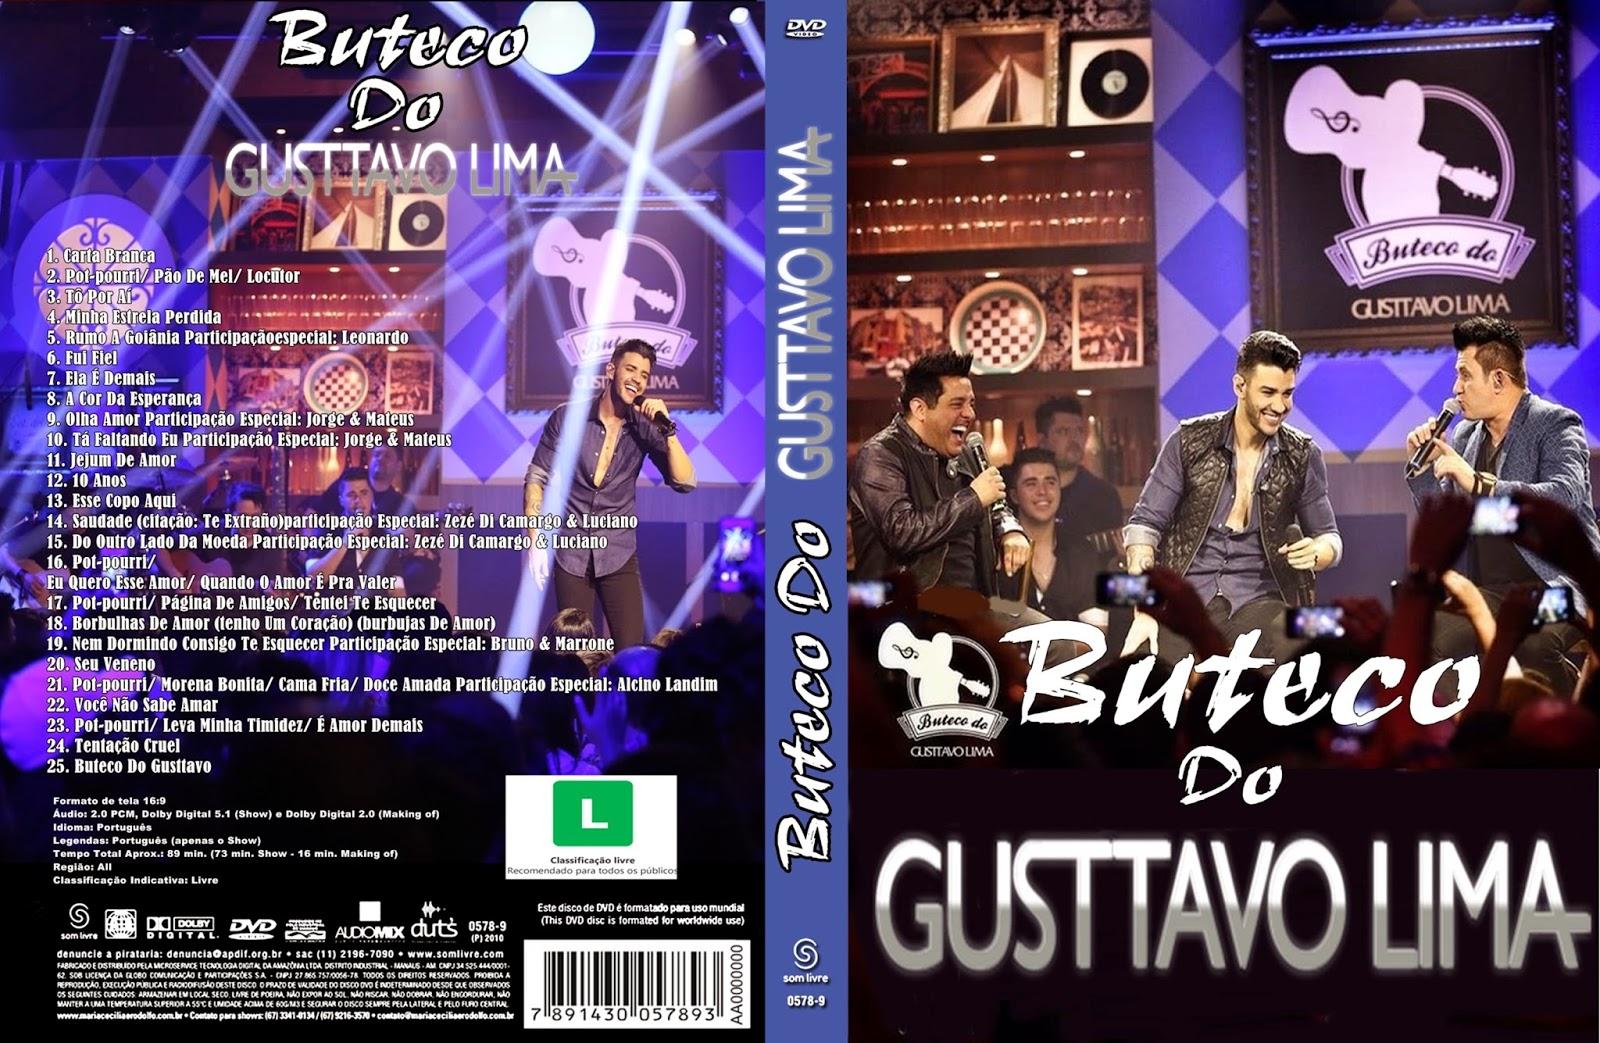 CD BUTECO BAIXAR GUSTAVO LIMA